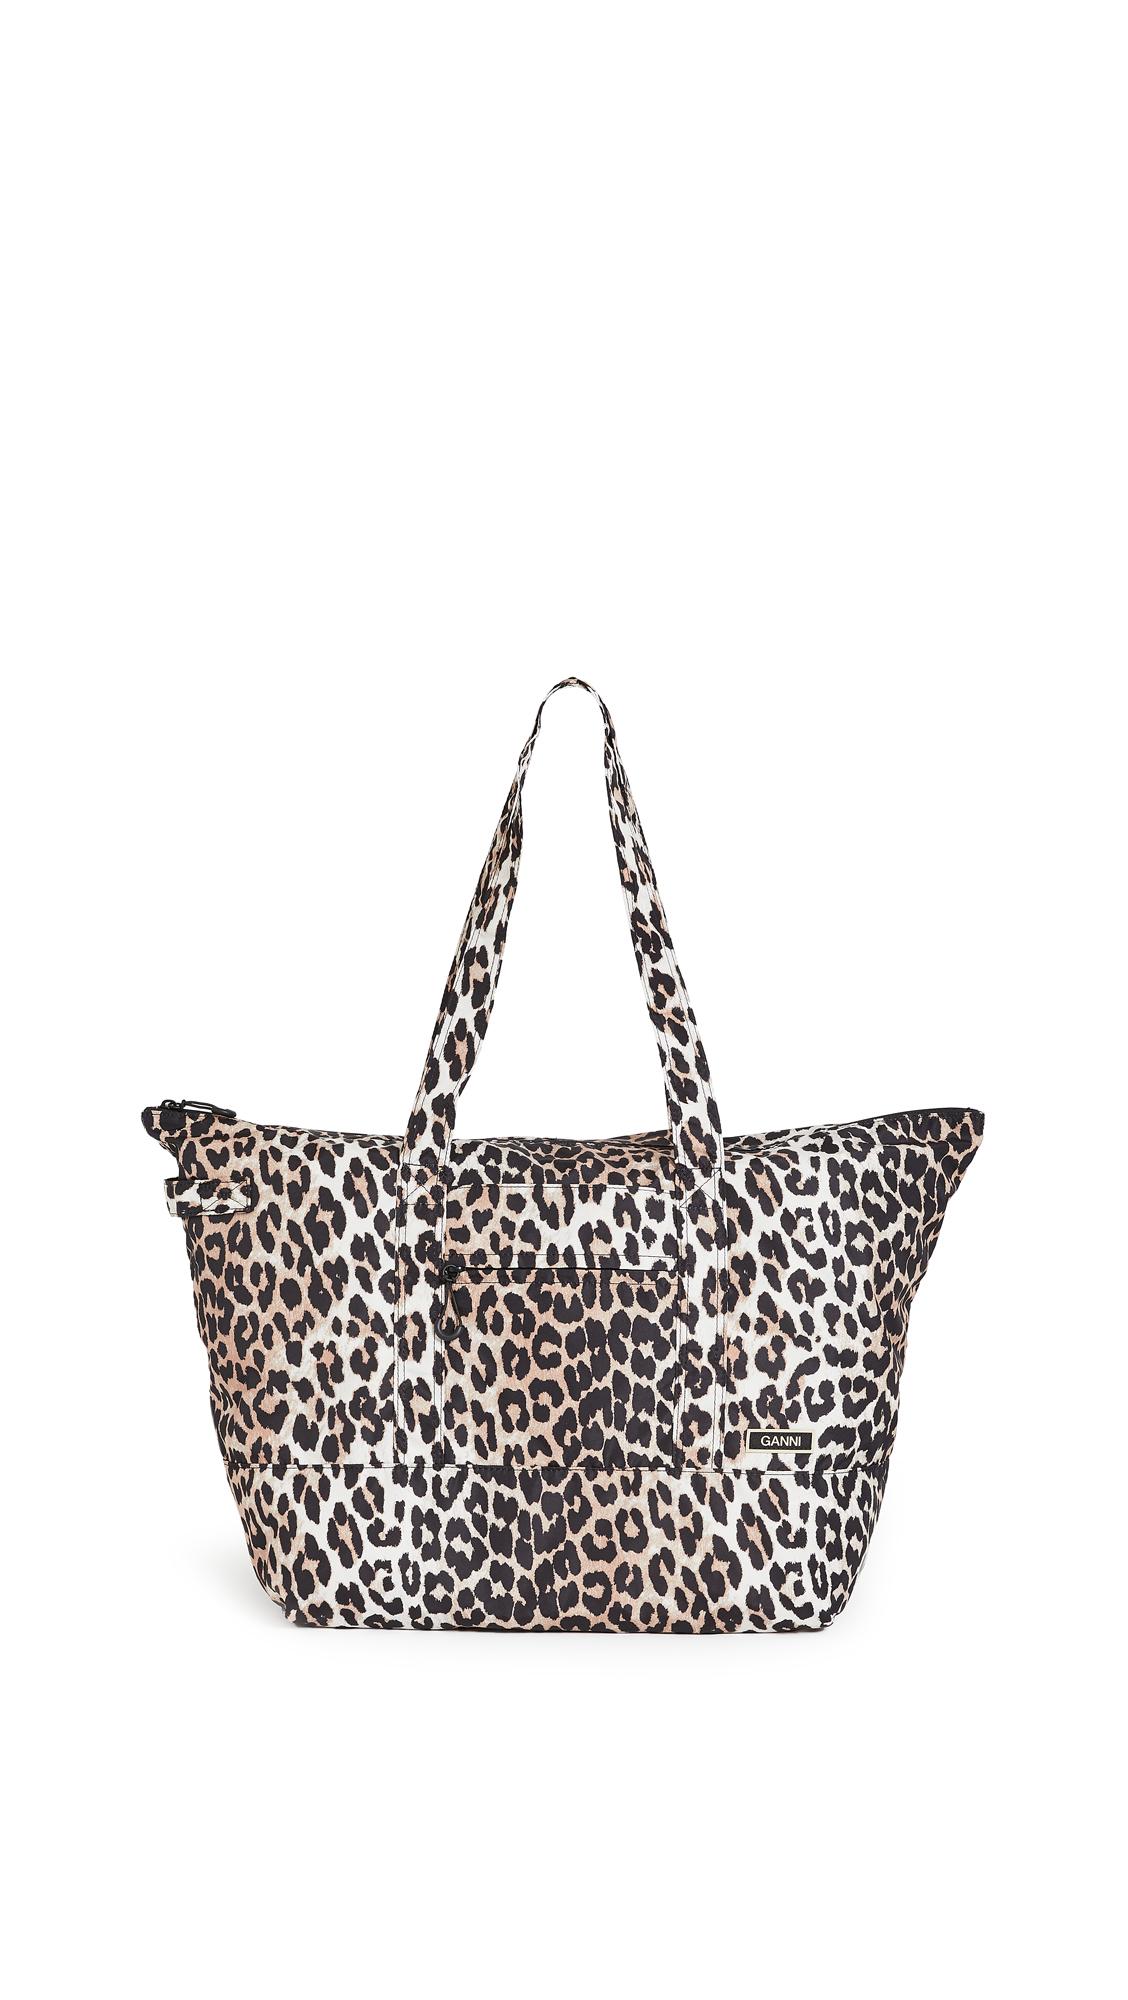 GANNI Leopard Tote Bag